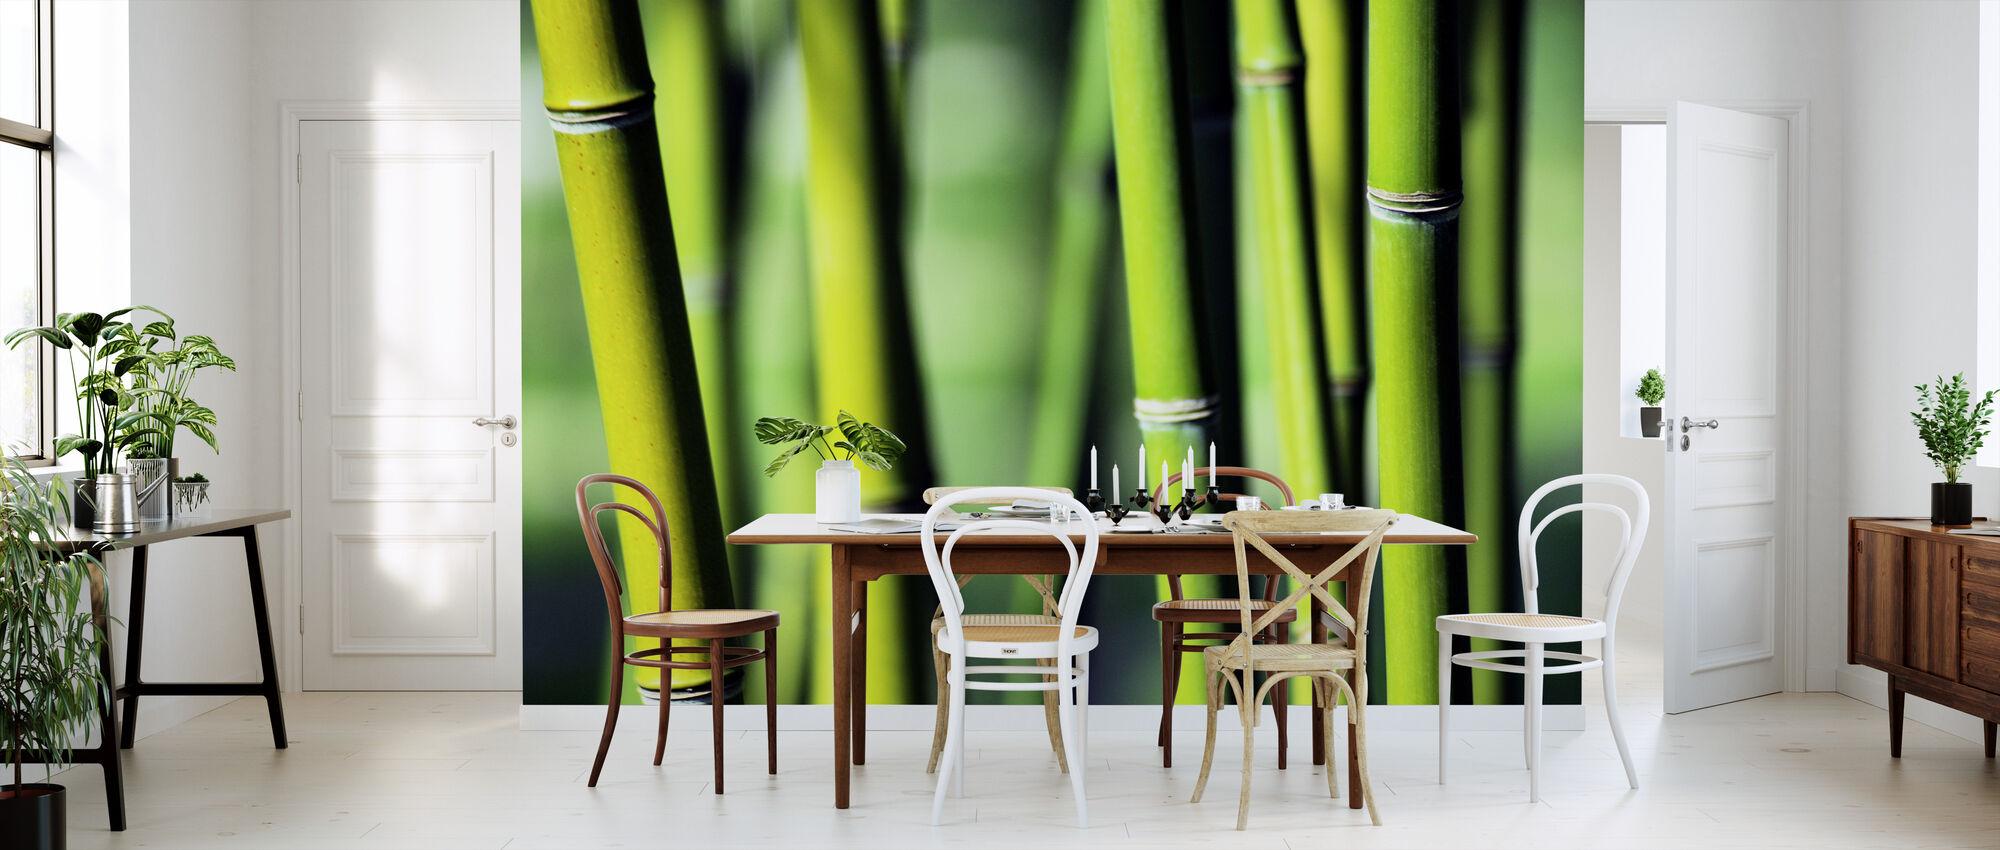 Evergreen - Wallpaper - Kitchen